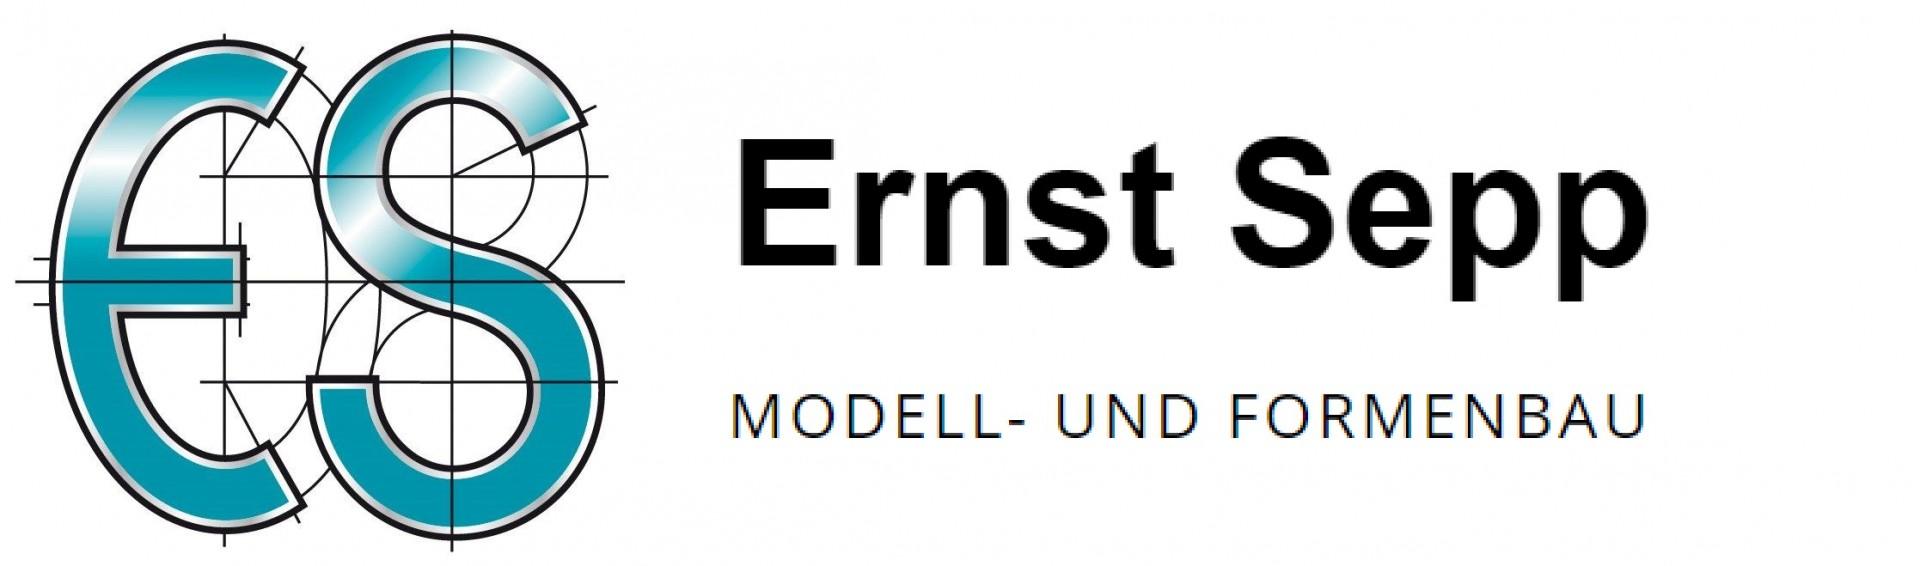 Ernst Sepp Modell- und Formenbau Logo